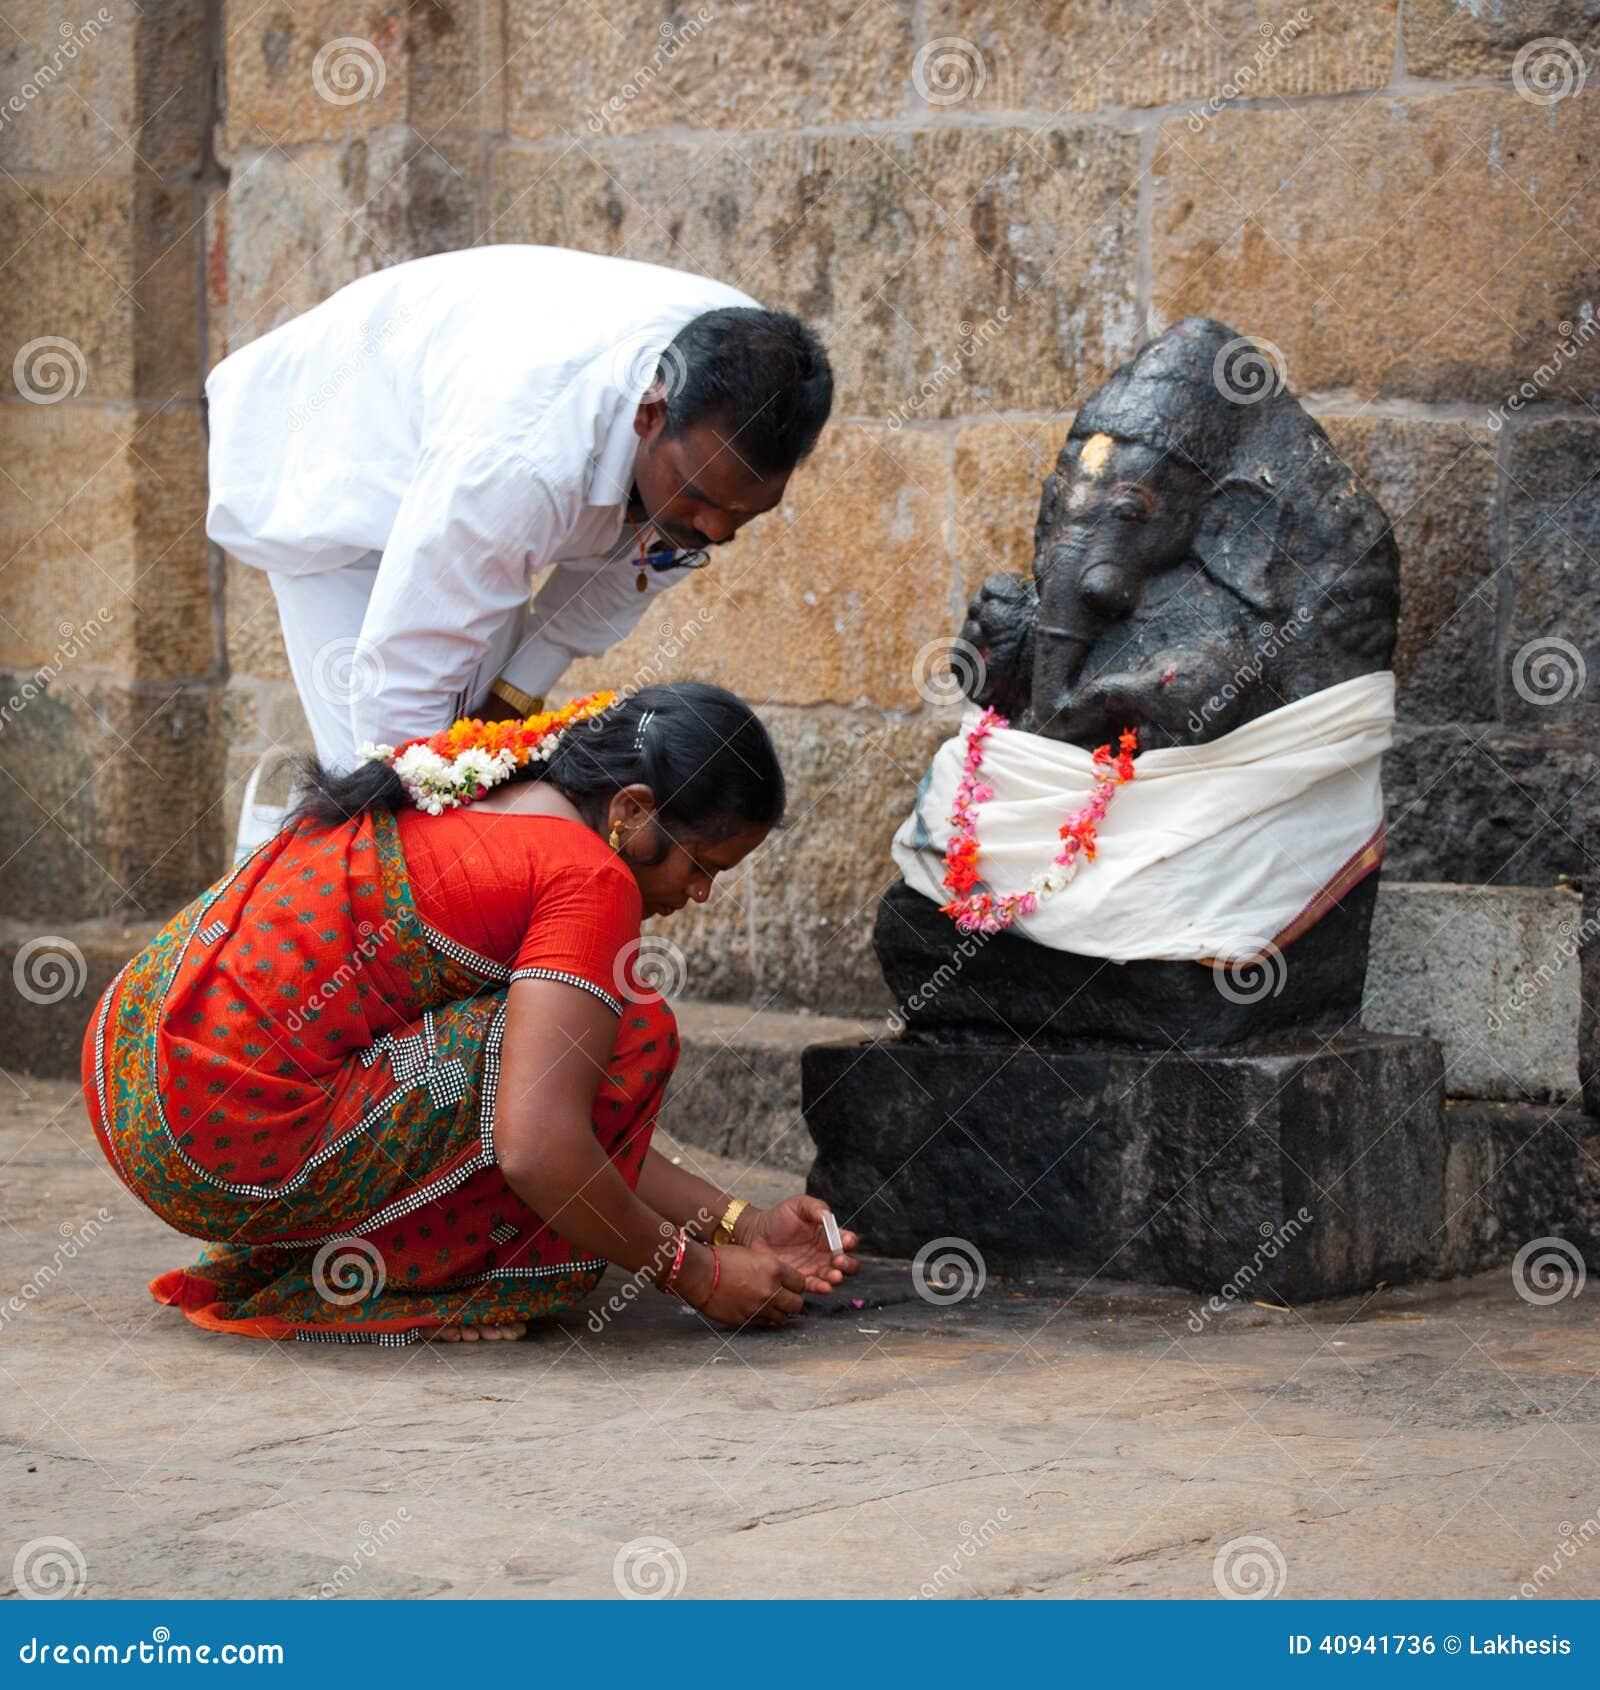 La gente india trae ofrendas a Ganesha en el templo de Gangaikonda Cholapuram La India, Tamil Nadu, Thanjavur (Trichy)